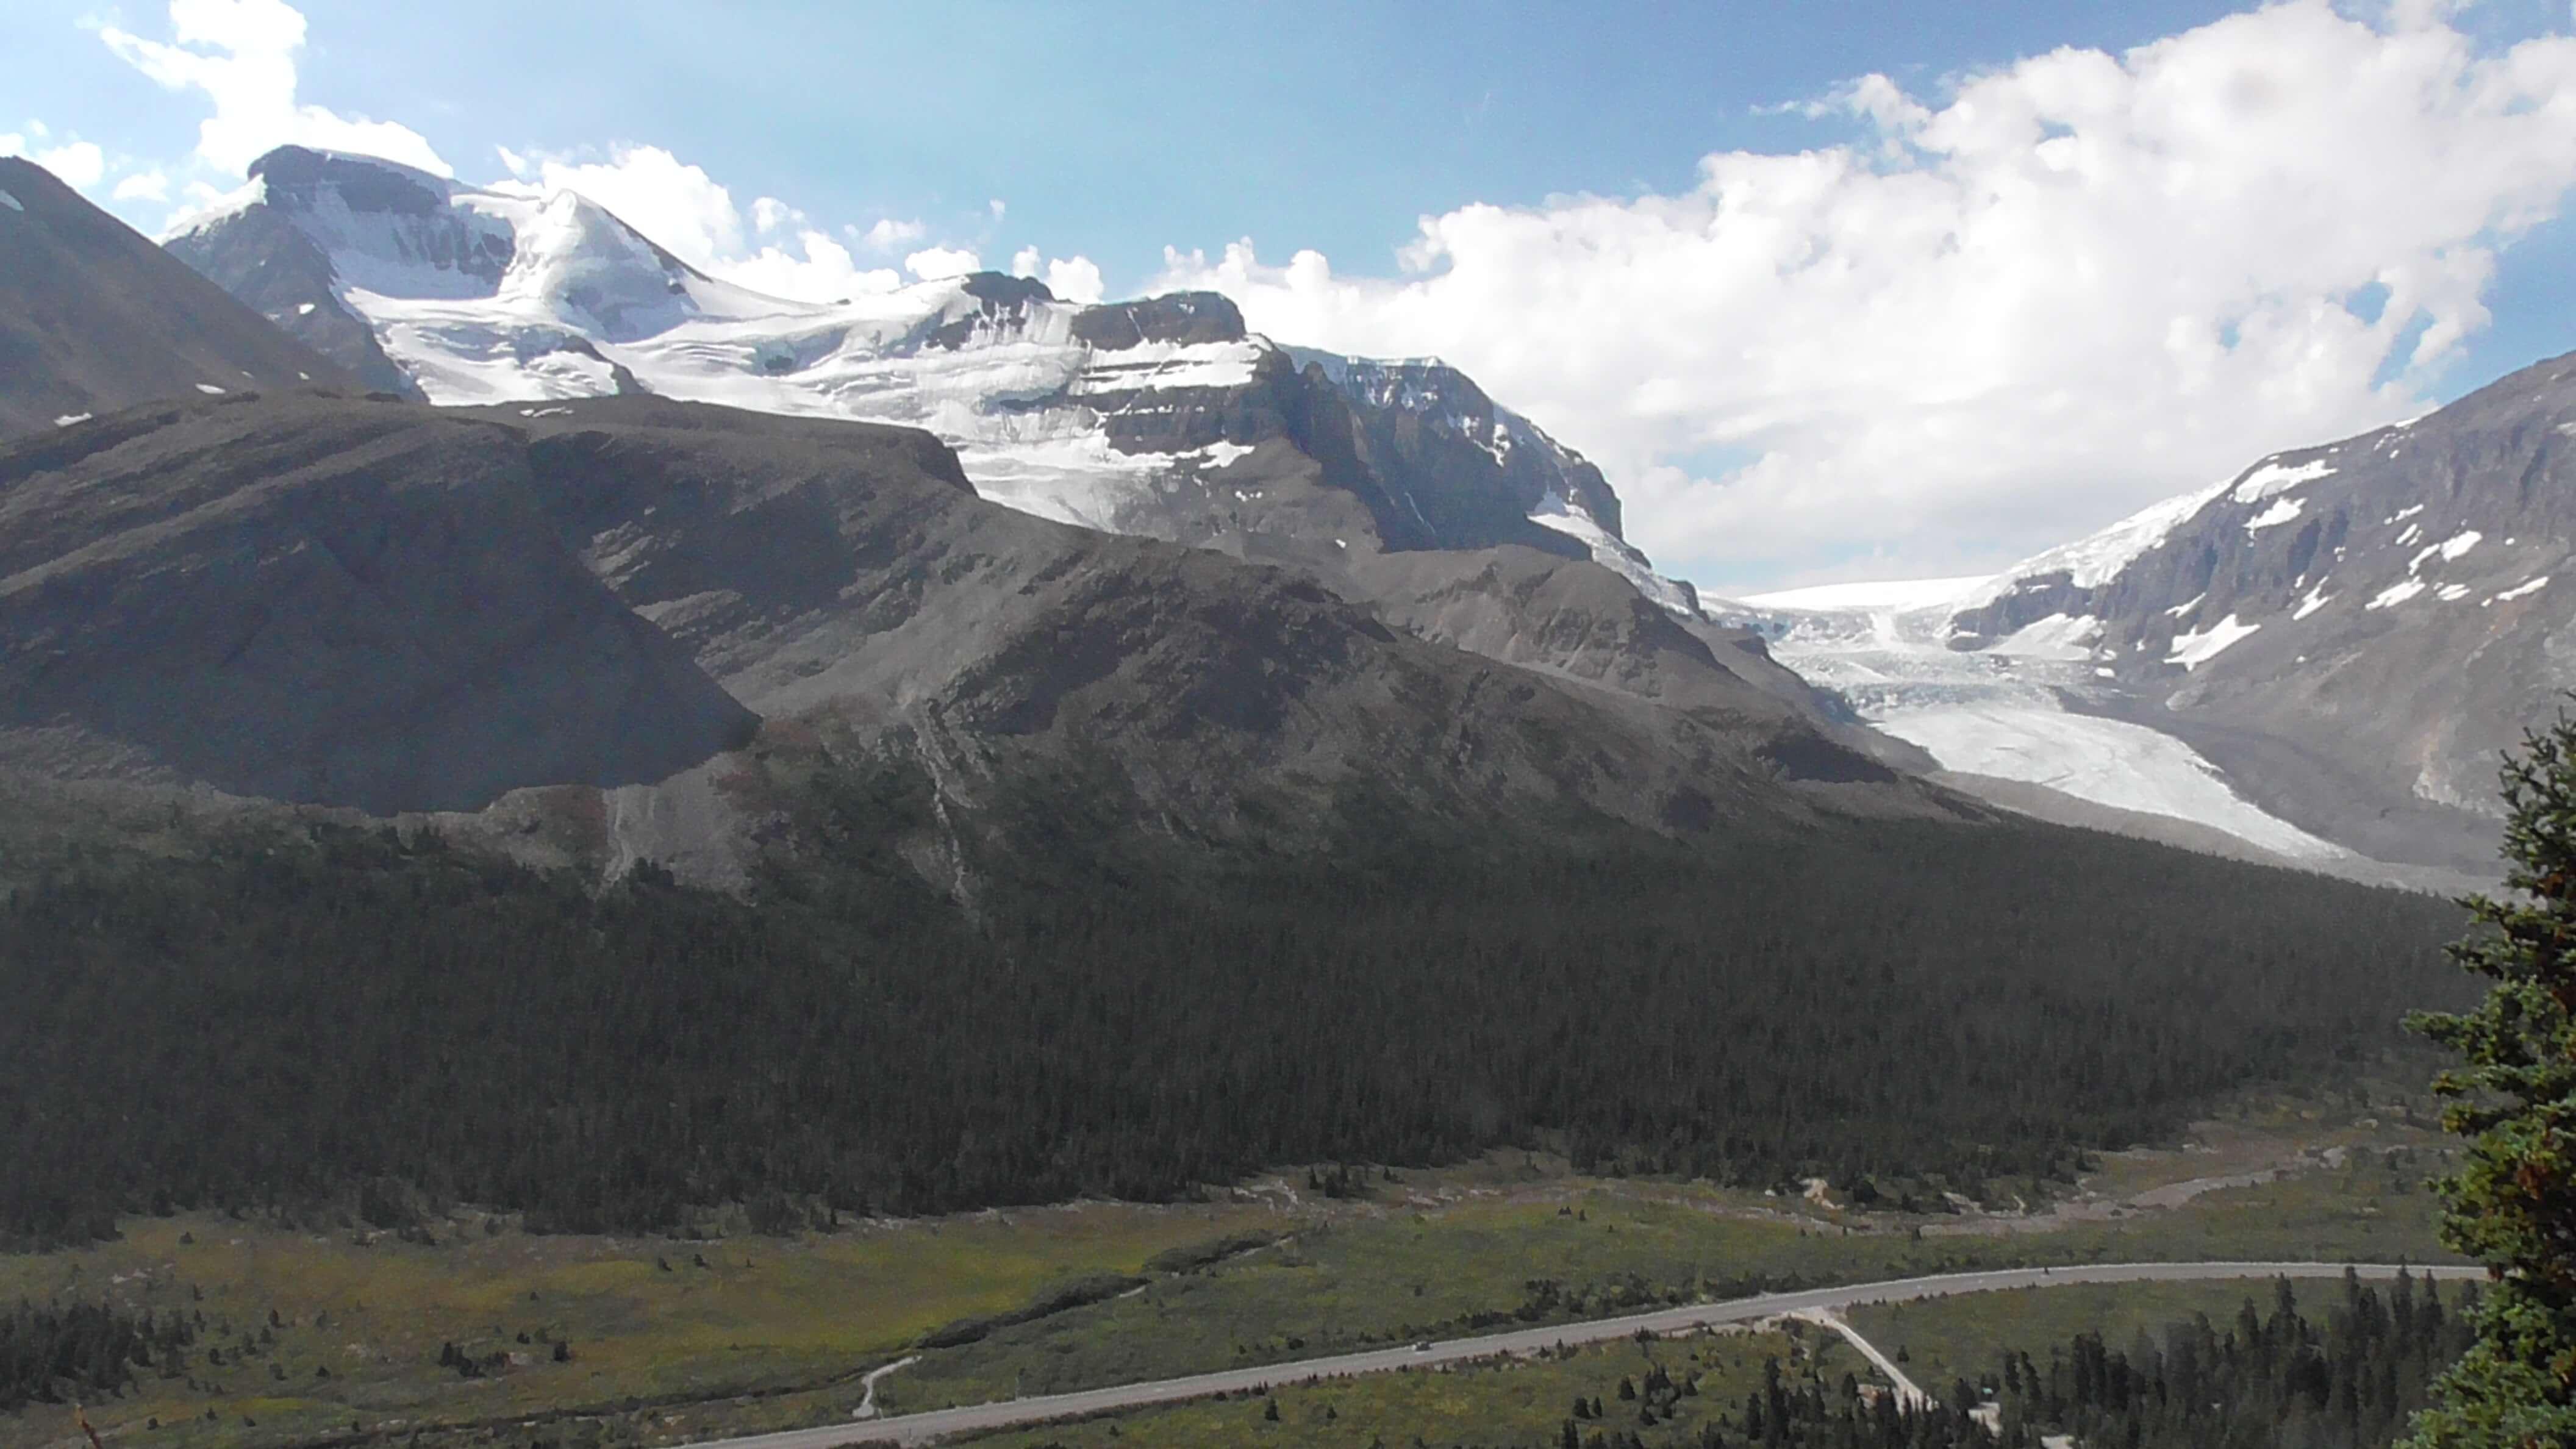 Hilda Glacier and Athabasca Glacier, Jasper National Park, Alberta